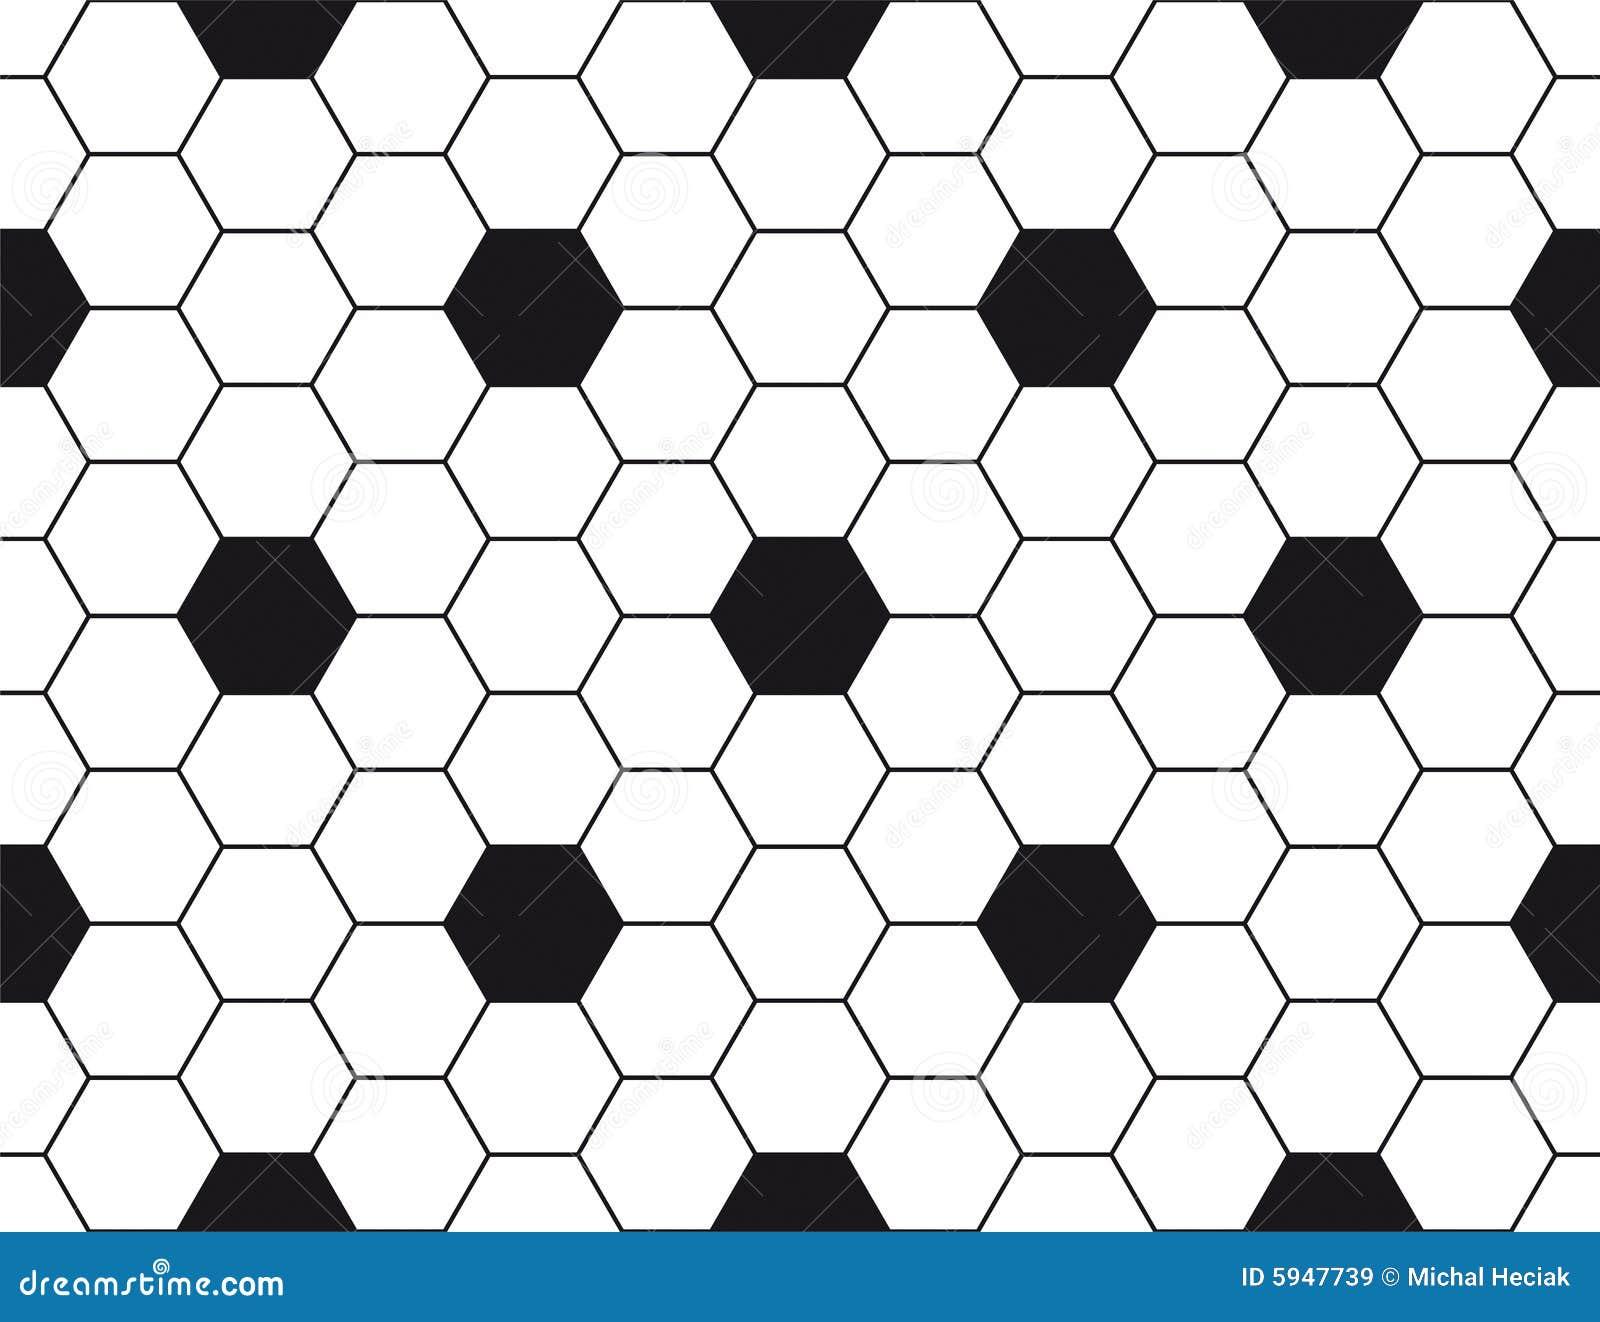 Hexagonal Texture Stock Vector Illustration Of Graphic